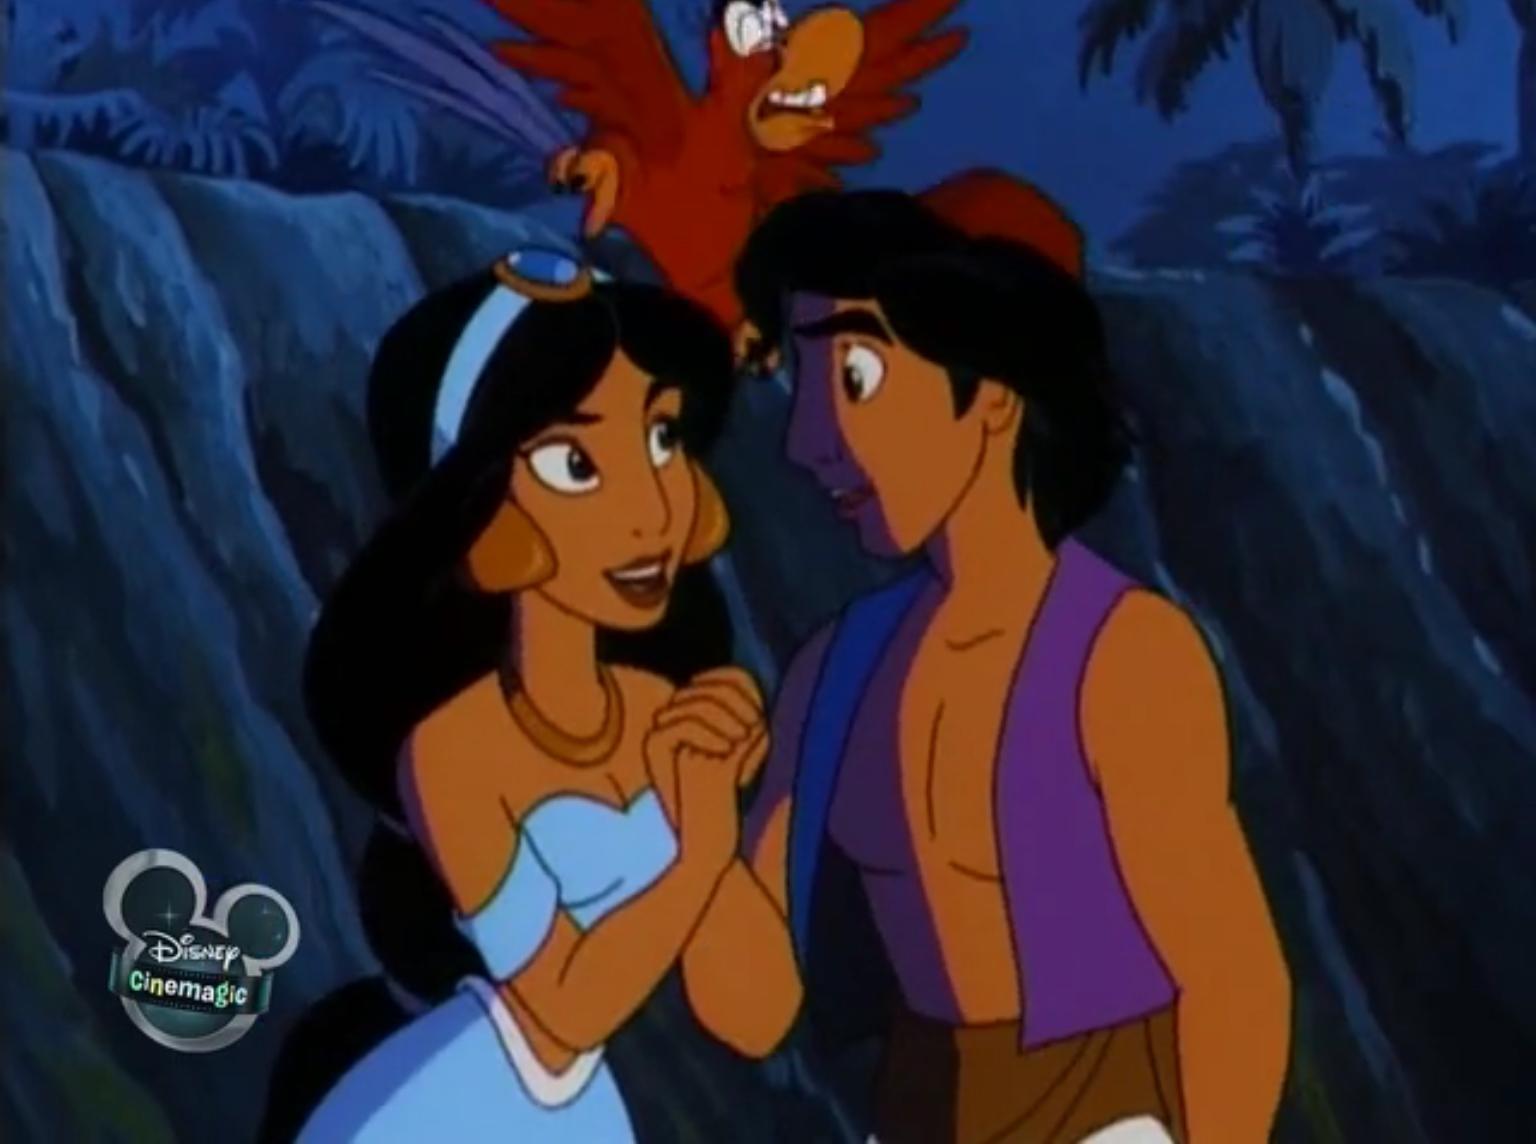 File:Aladdin & Jasmine - Moonlight Madness (3).jpg